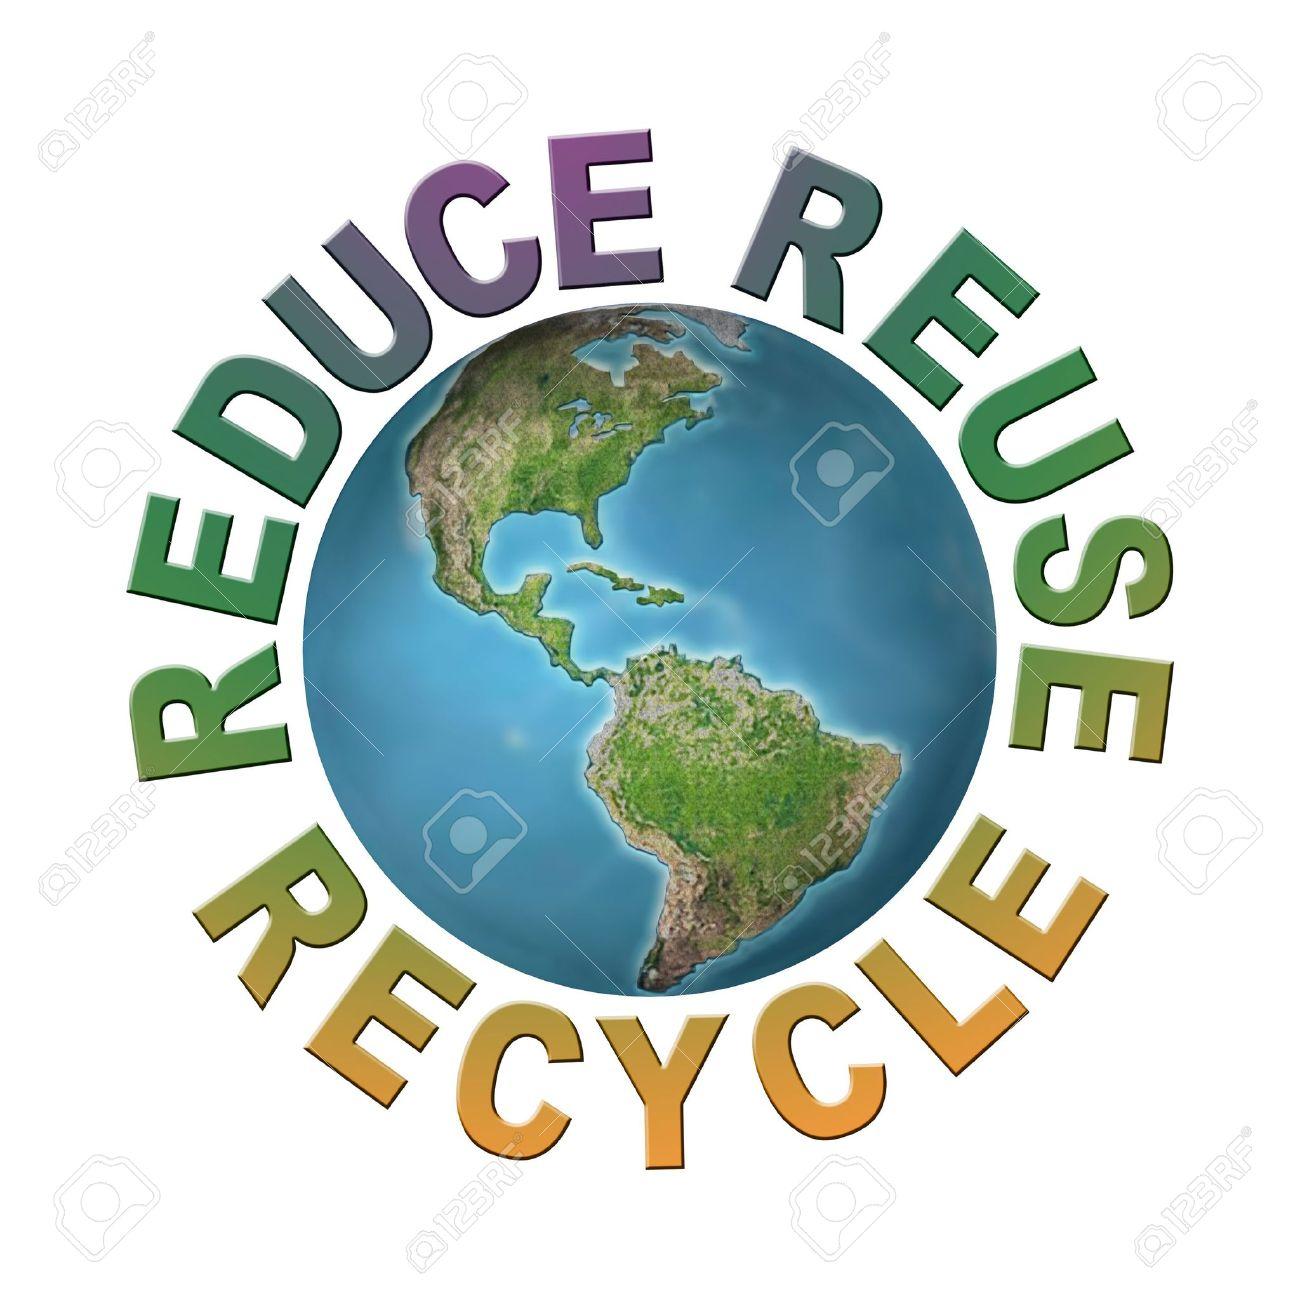 Mundo Planeta Rodeado Por Tres Frases Ecológicas Reducir Reutilizar Reciclar Concepto Planeta Limpio